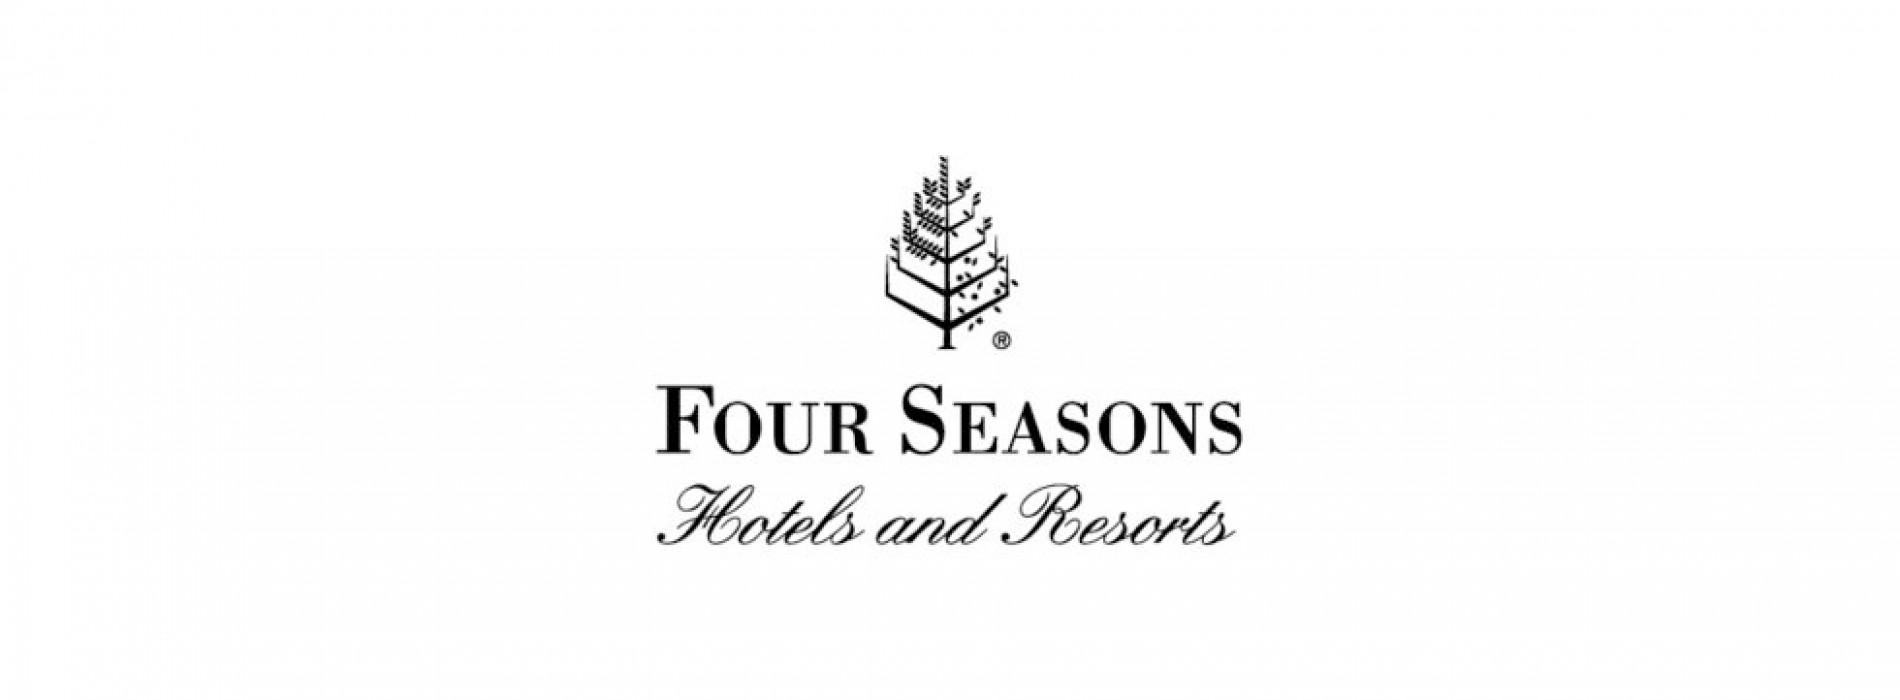 Four Seasons Hotel Kuala Lumpur set to open in 2018